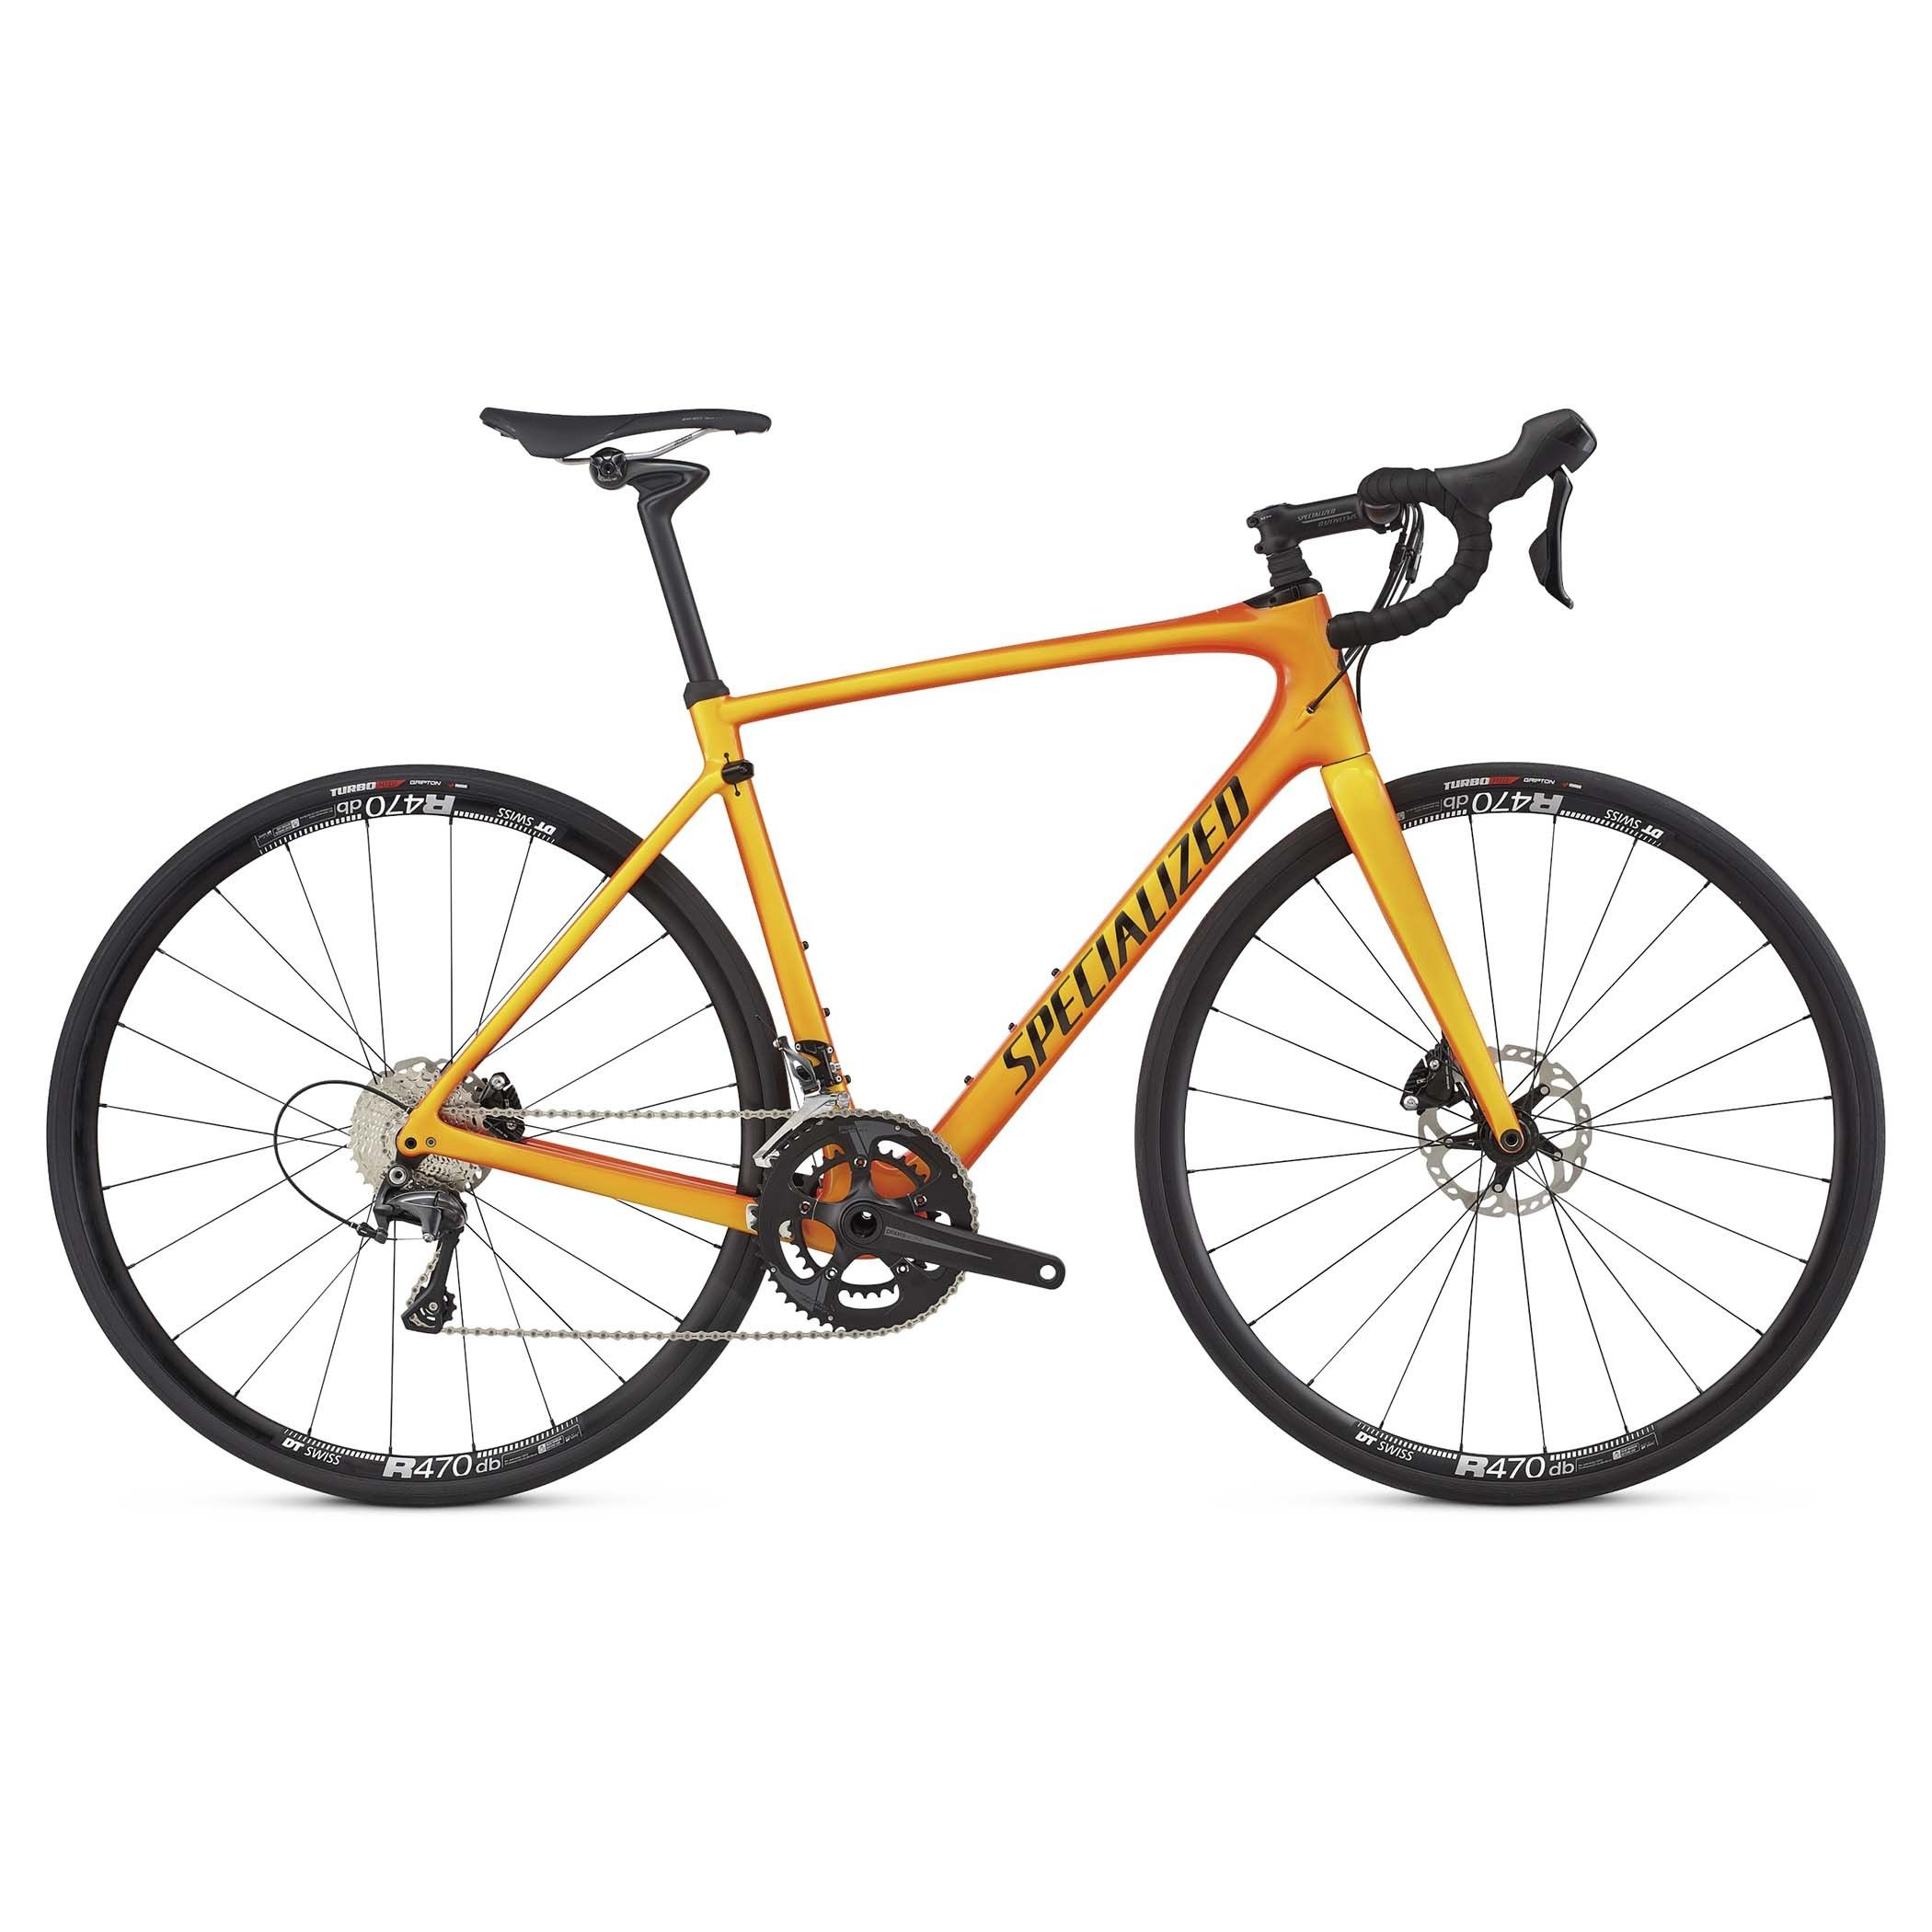 Specialized Roubaix Comp 3200 Specialized road bikes